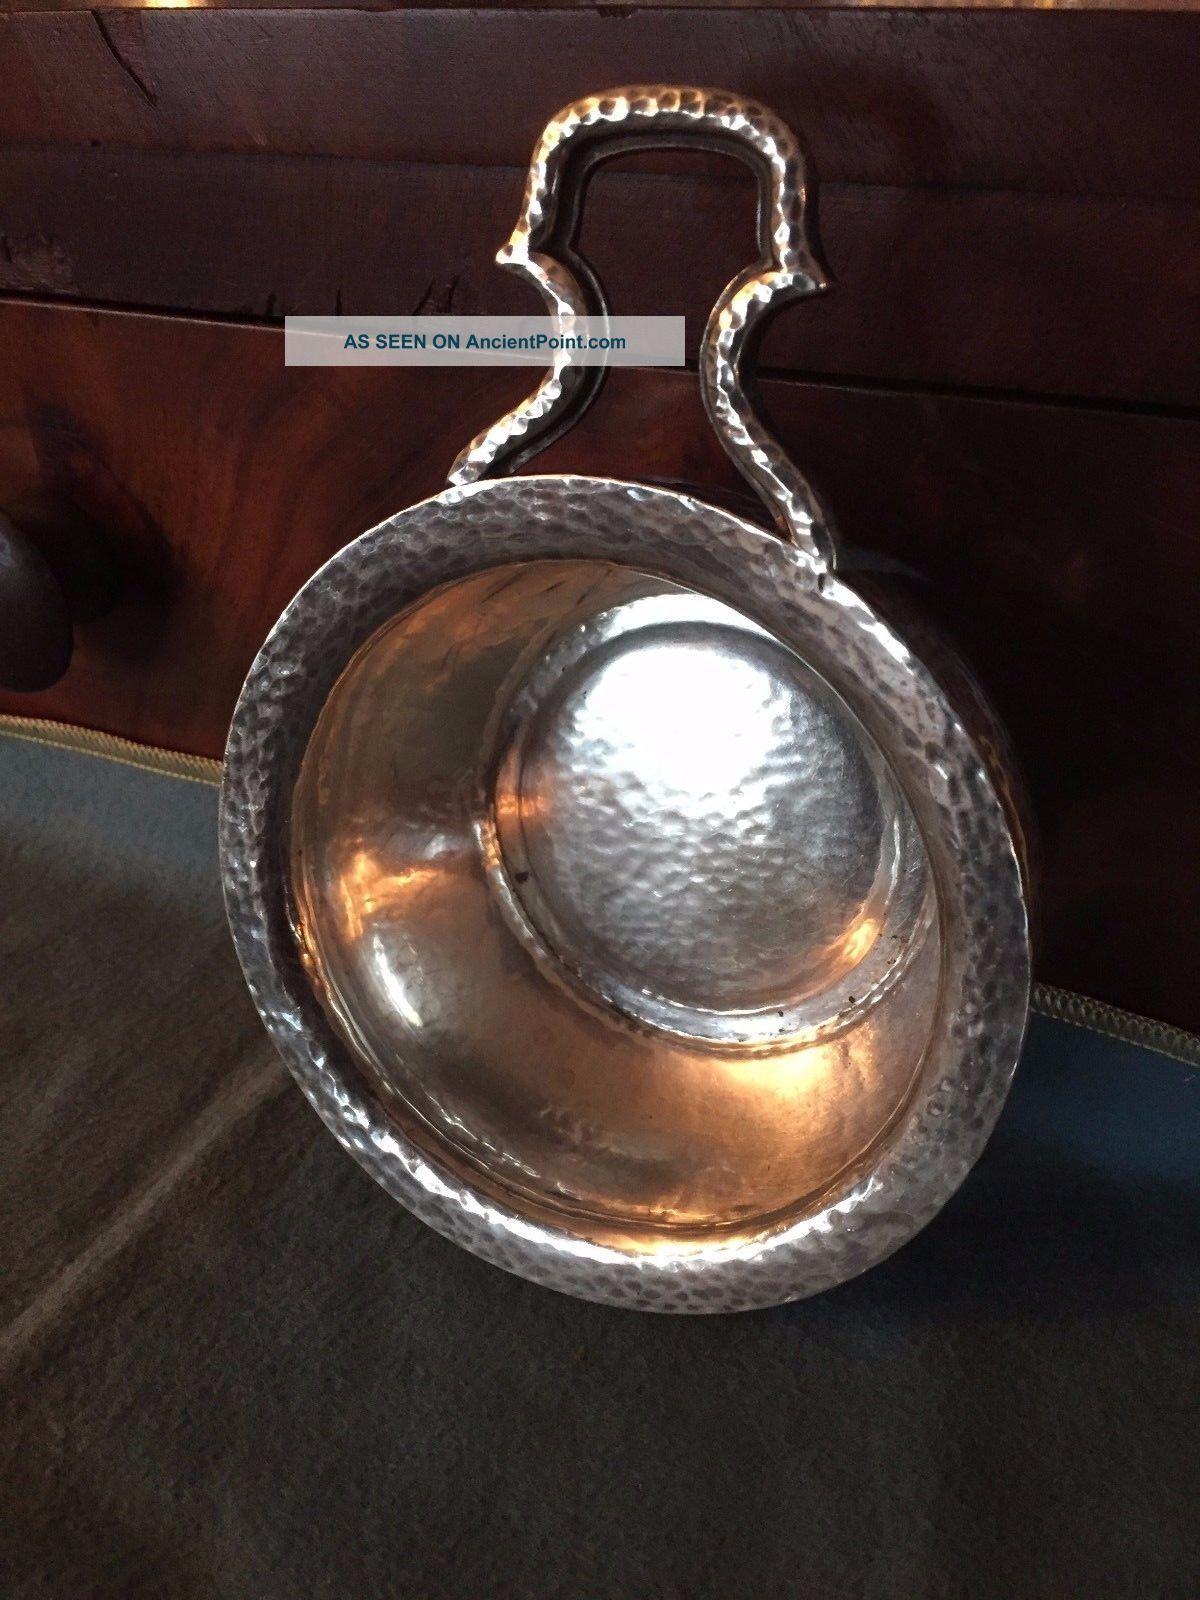 Gorham Arts & Craft Hand Hammered Sterling Silver Porringer A1772 No Mono Bowls photo